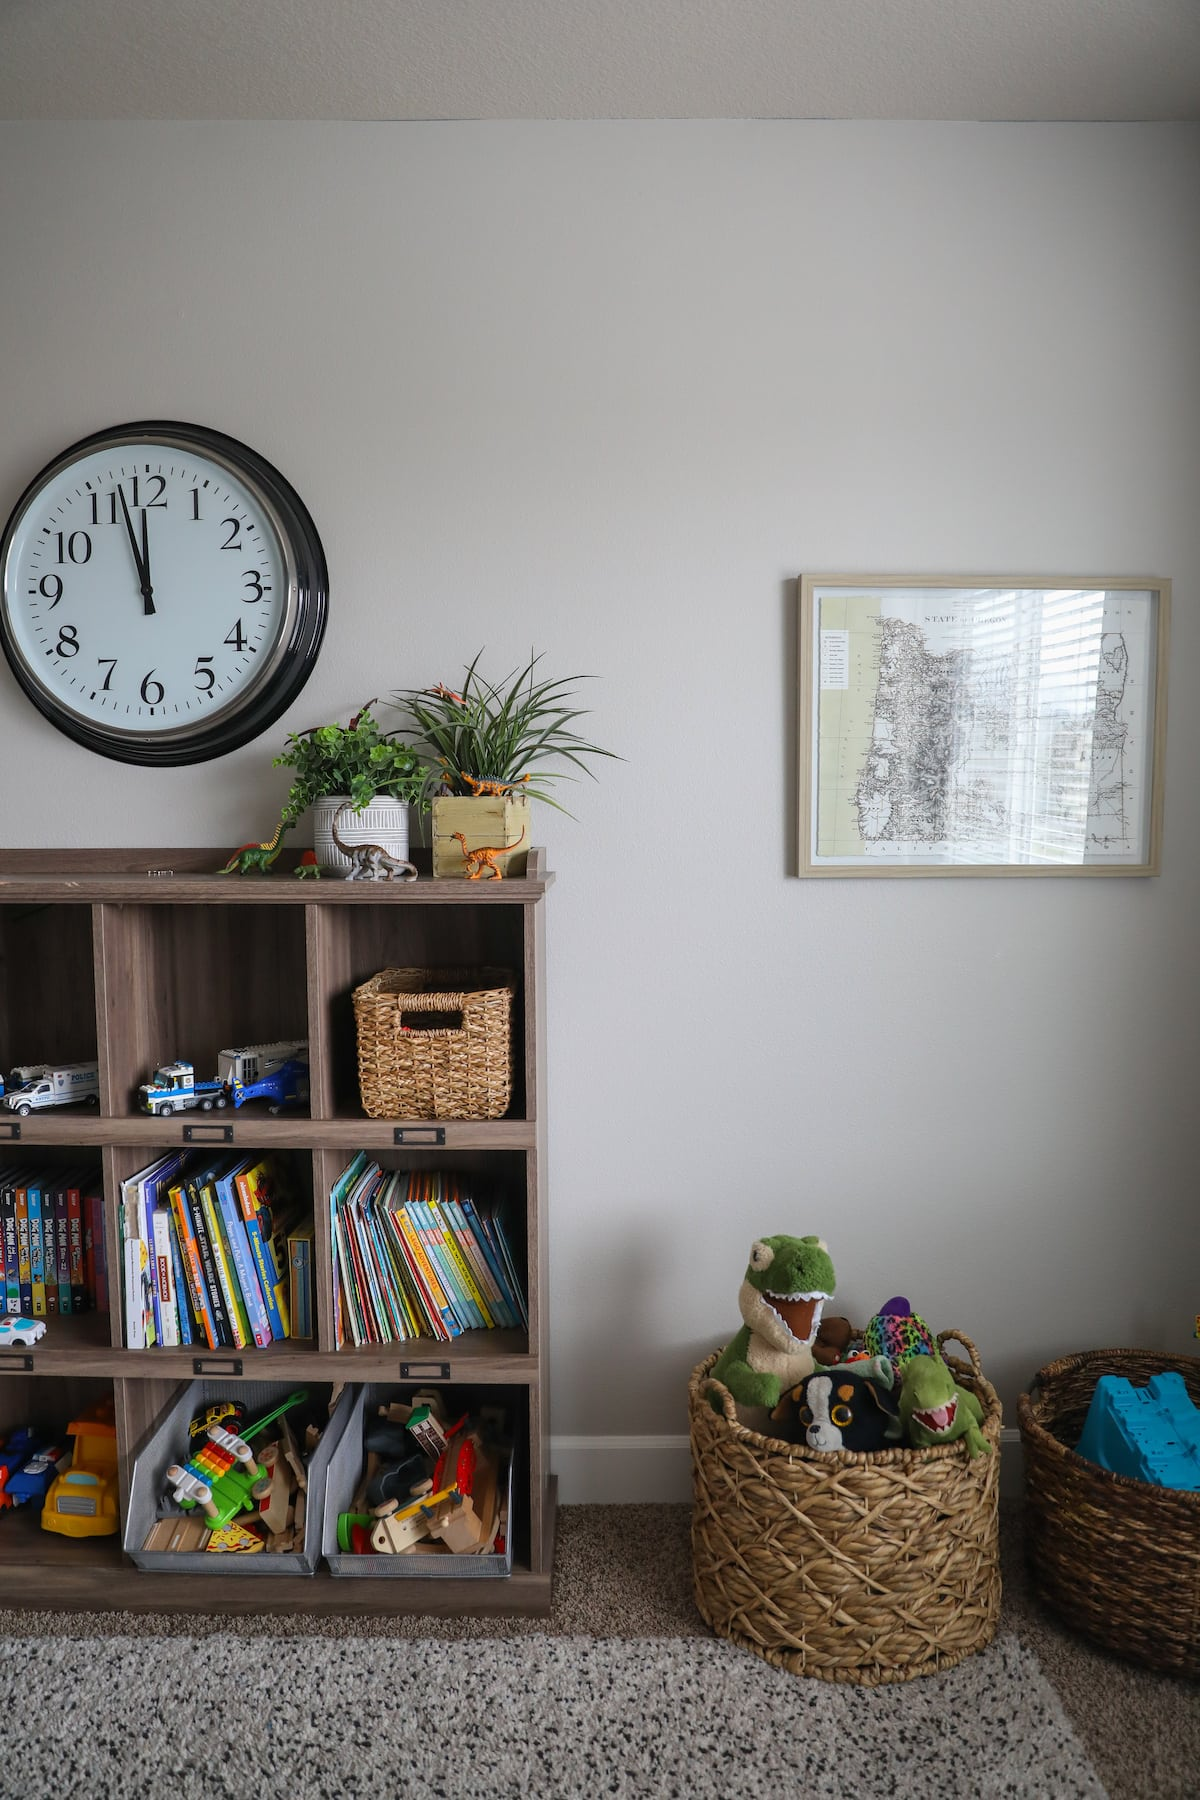 book shelf and baskets